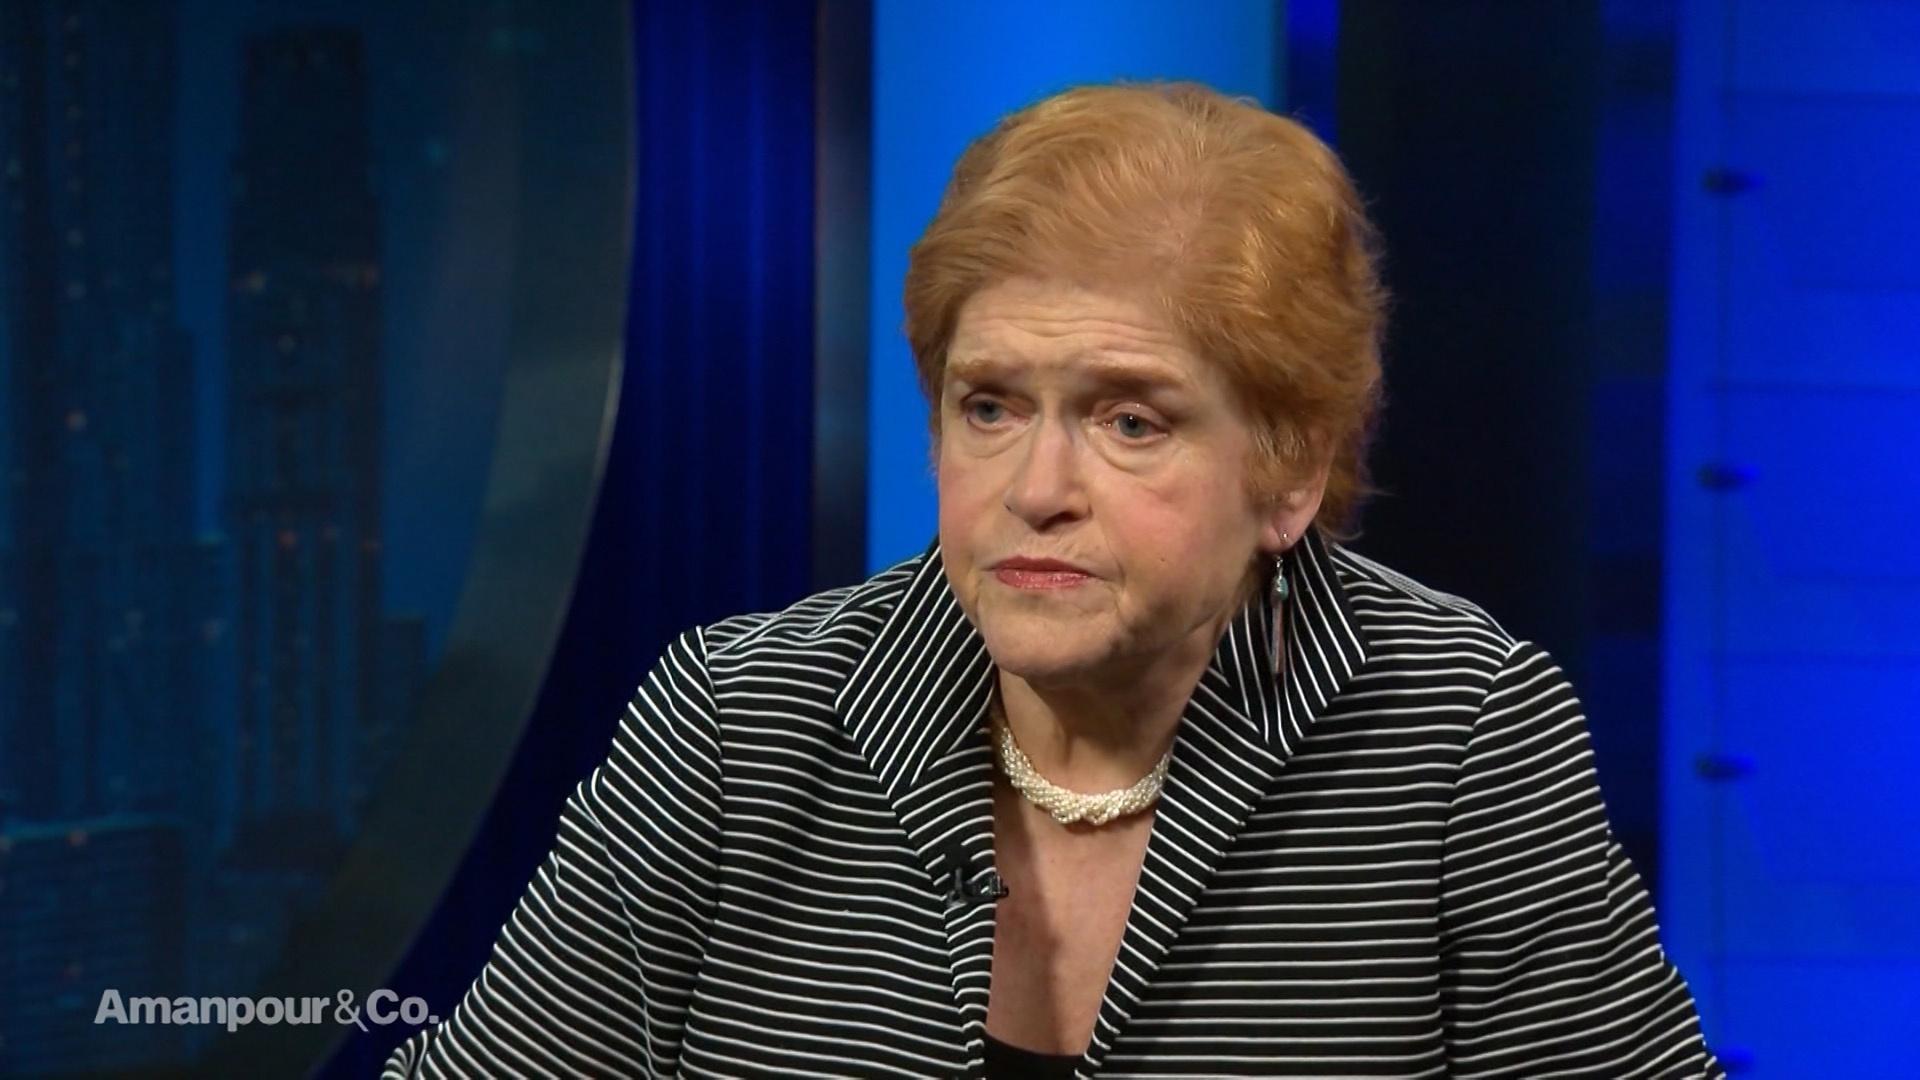 Deborah Lipstadt on Fighting Antisemitism and Hatr